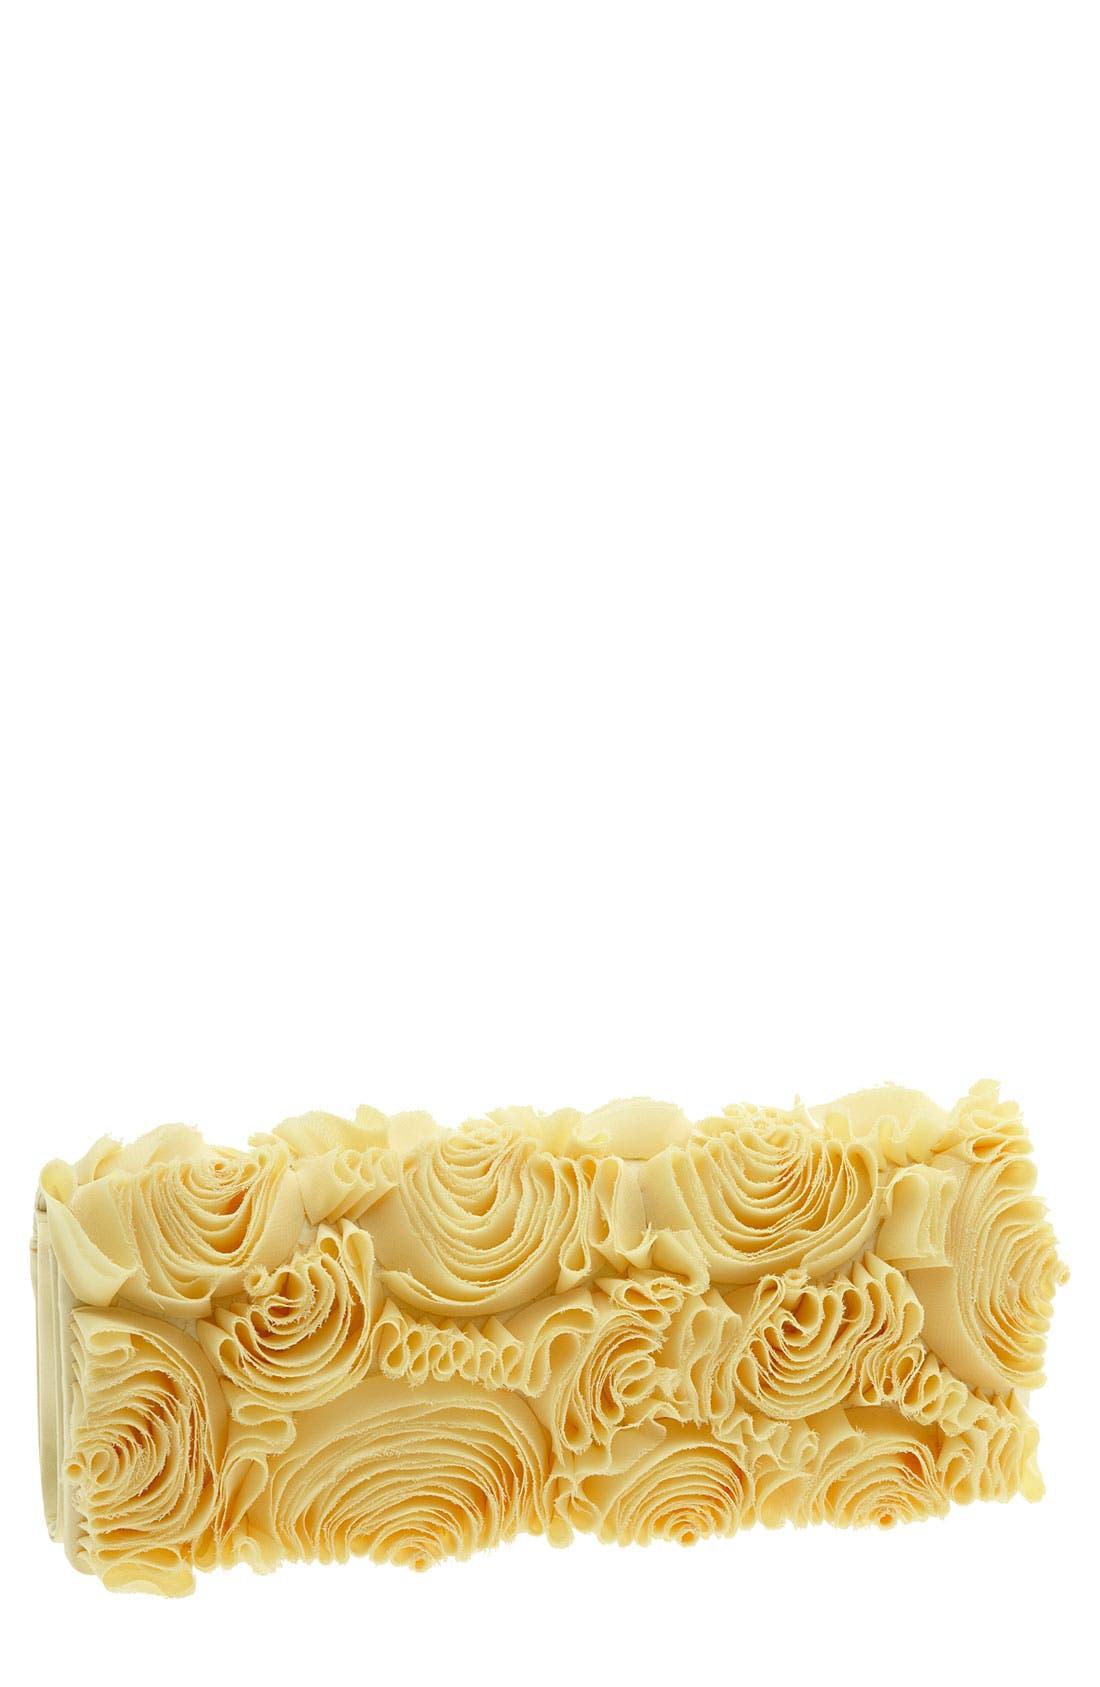 Main Image - Sondra Roberts Floral Organza Clutch